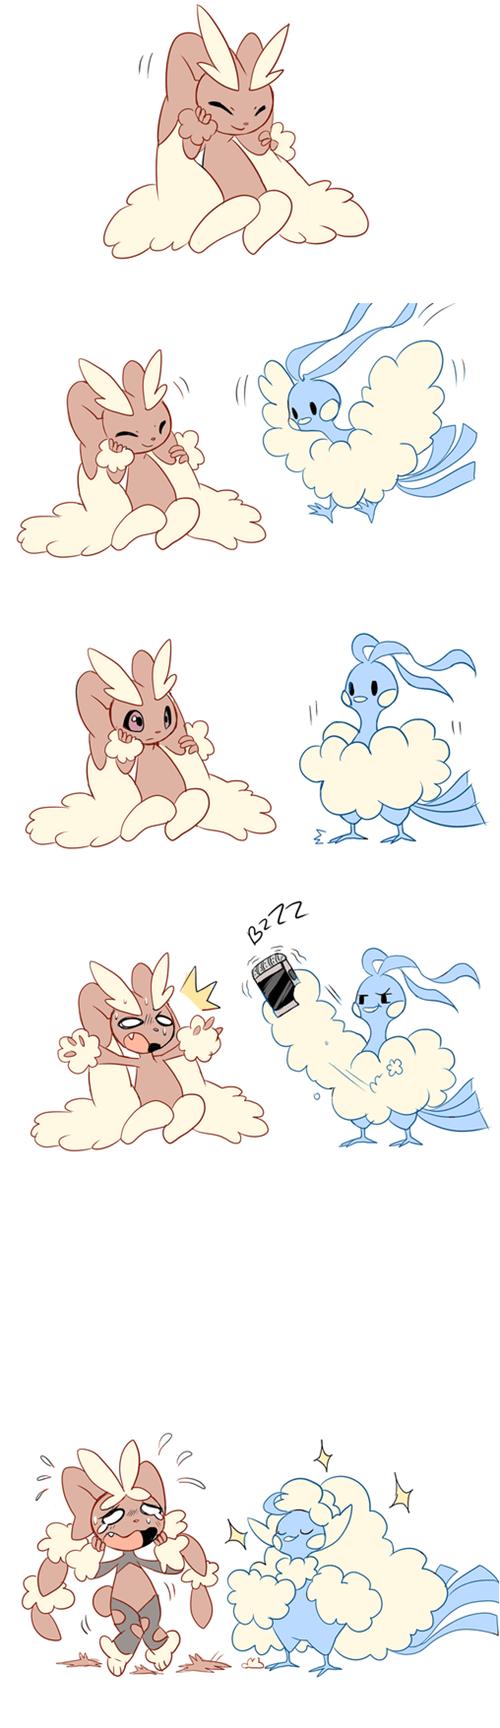 mega lopunny,Pokémon,FanArt,cute,mega altaria